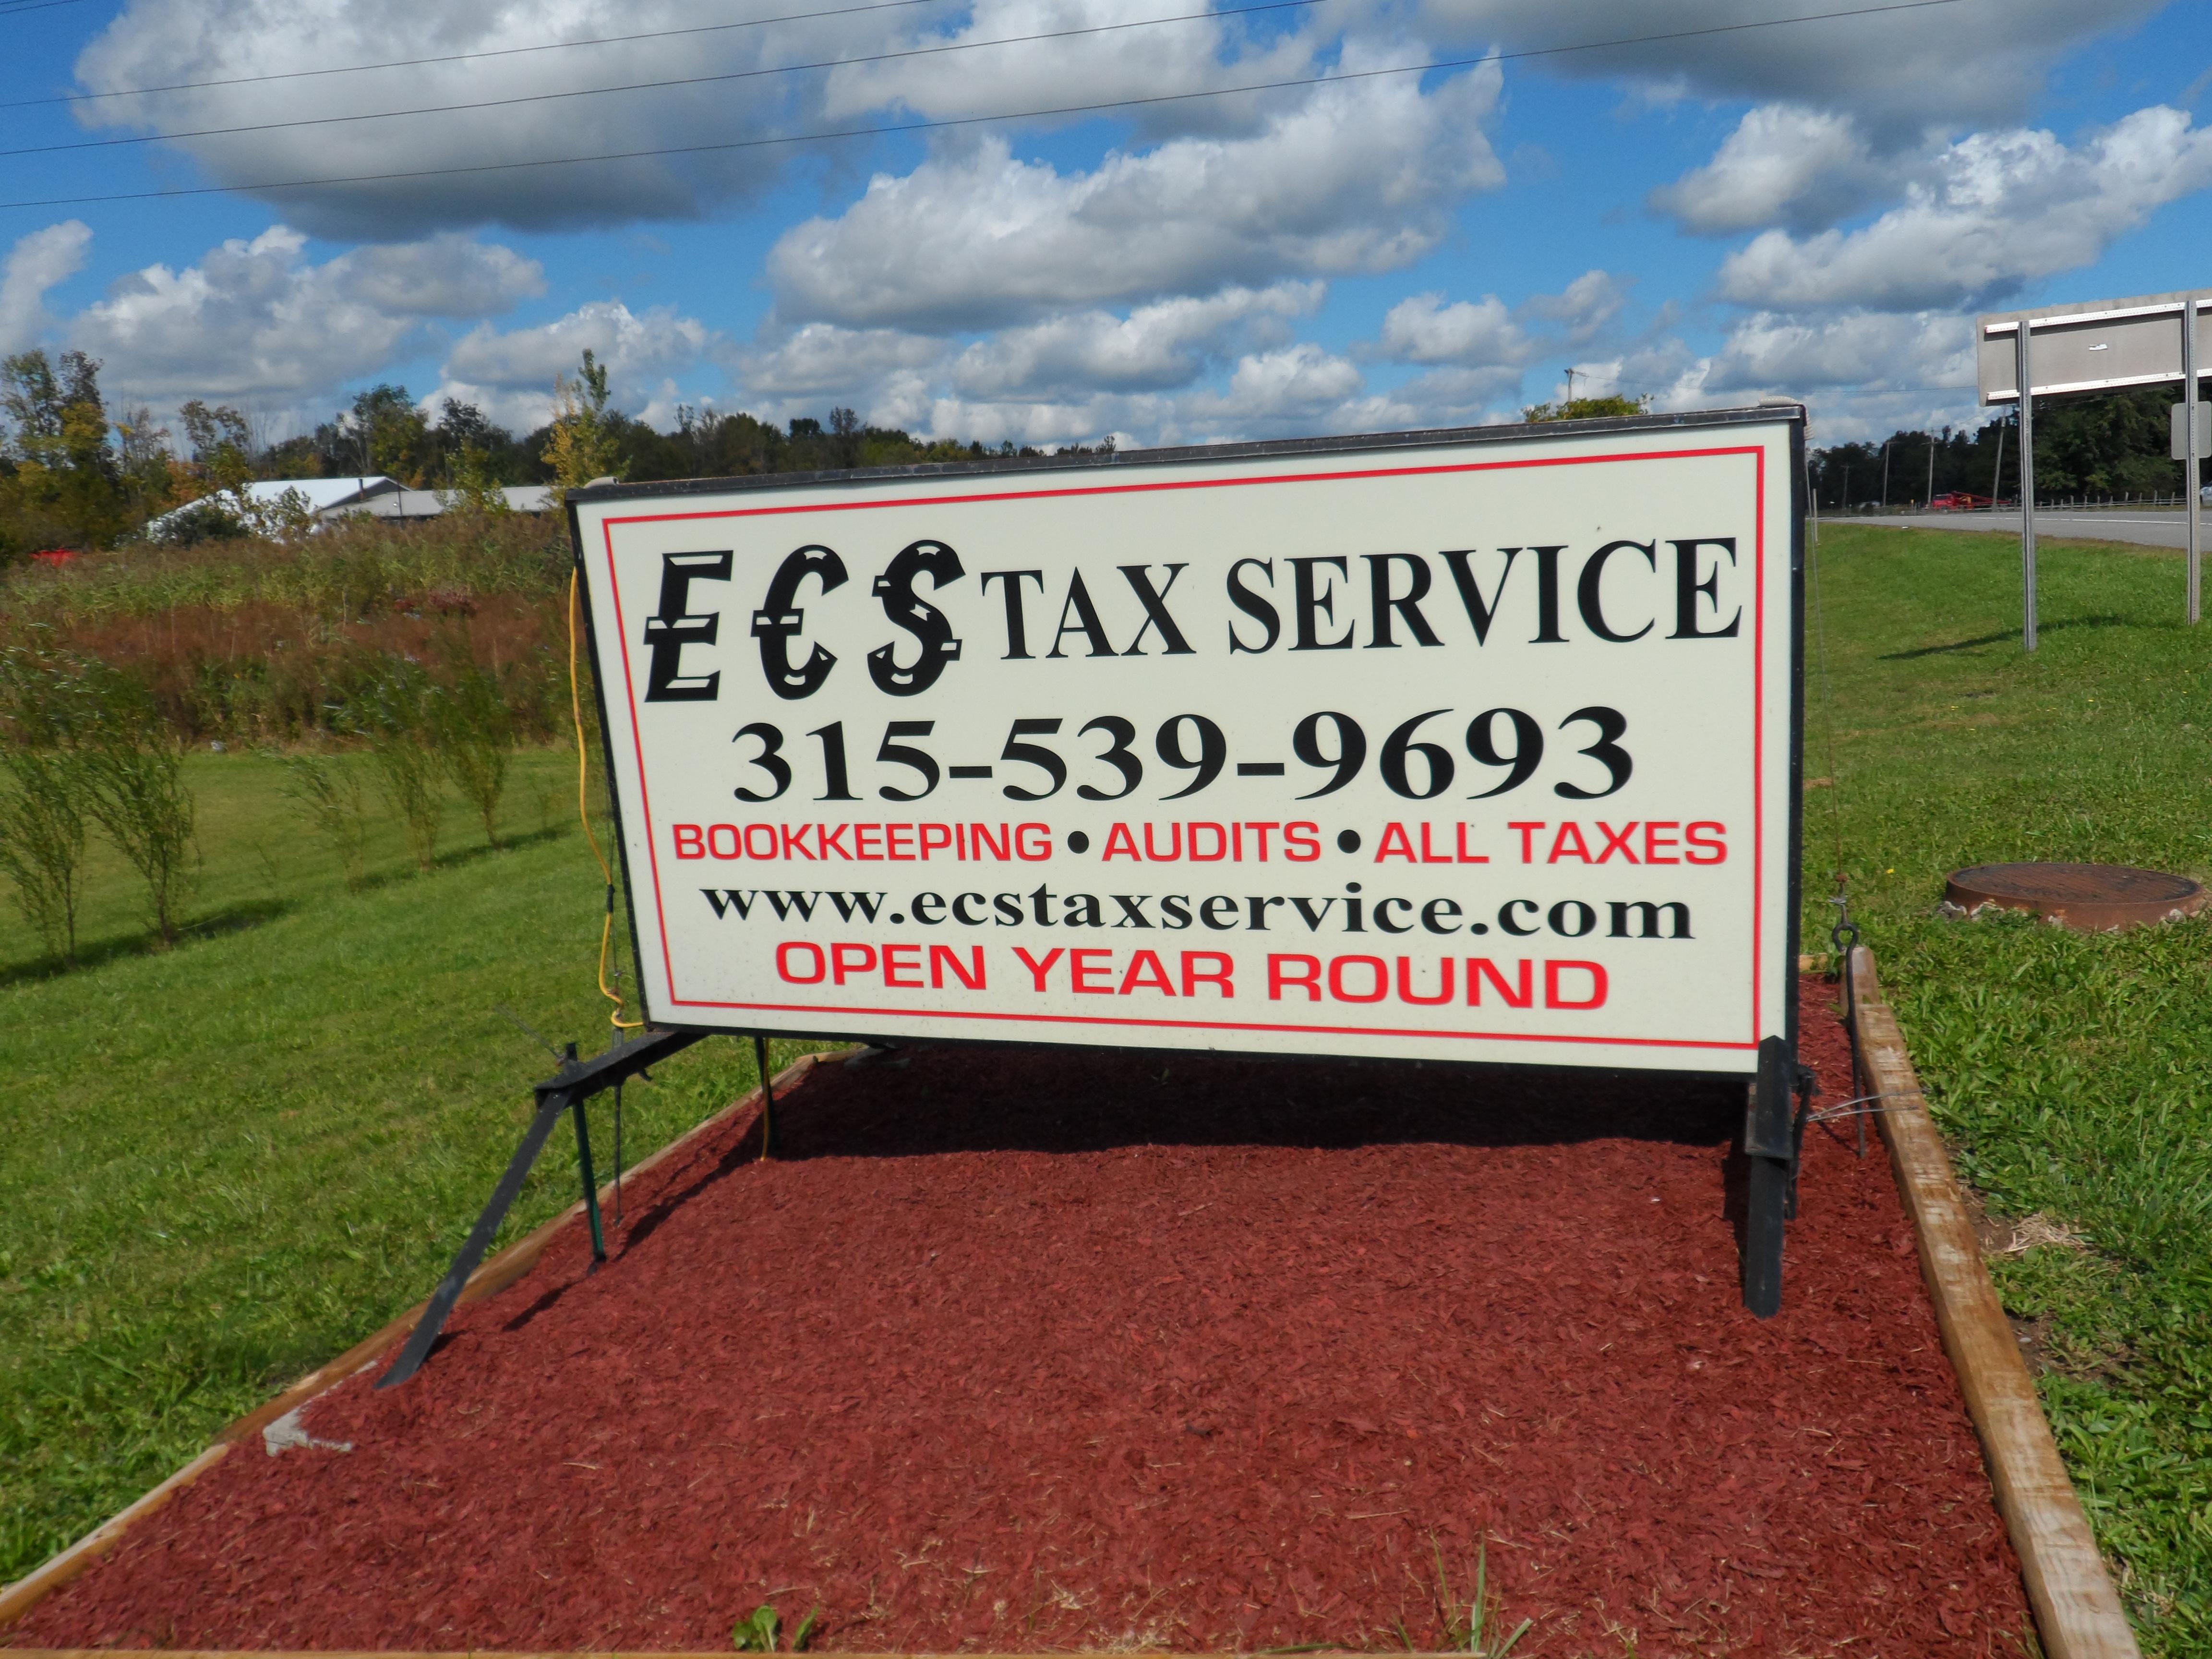 ECS Tax Service image 1